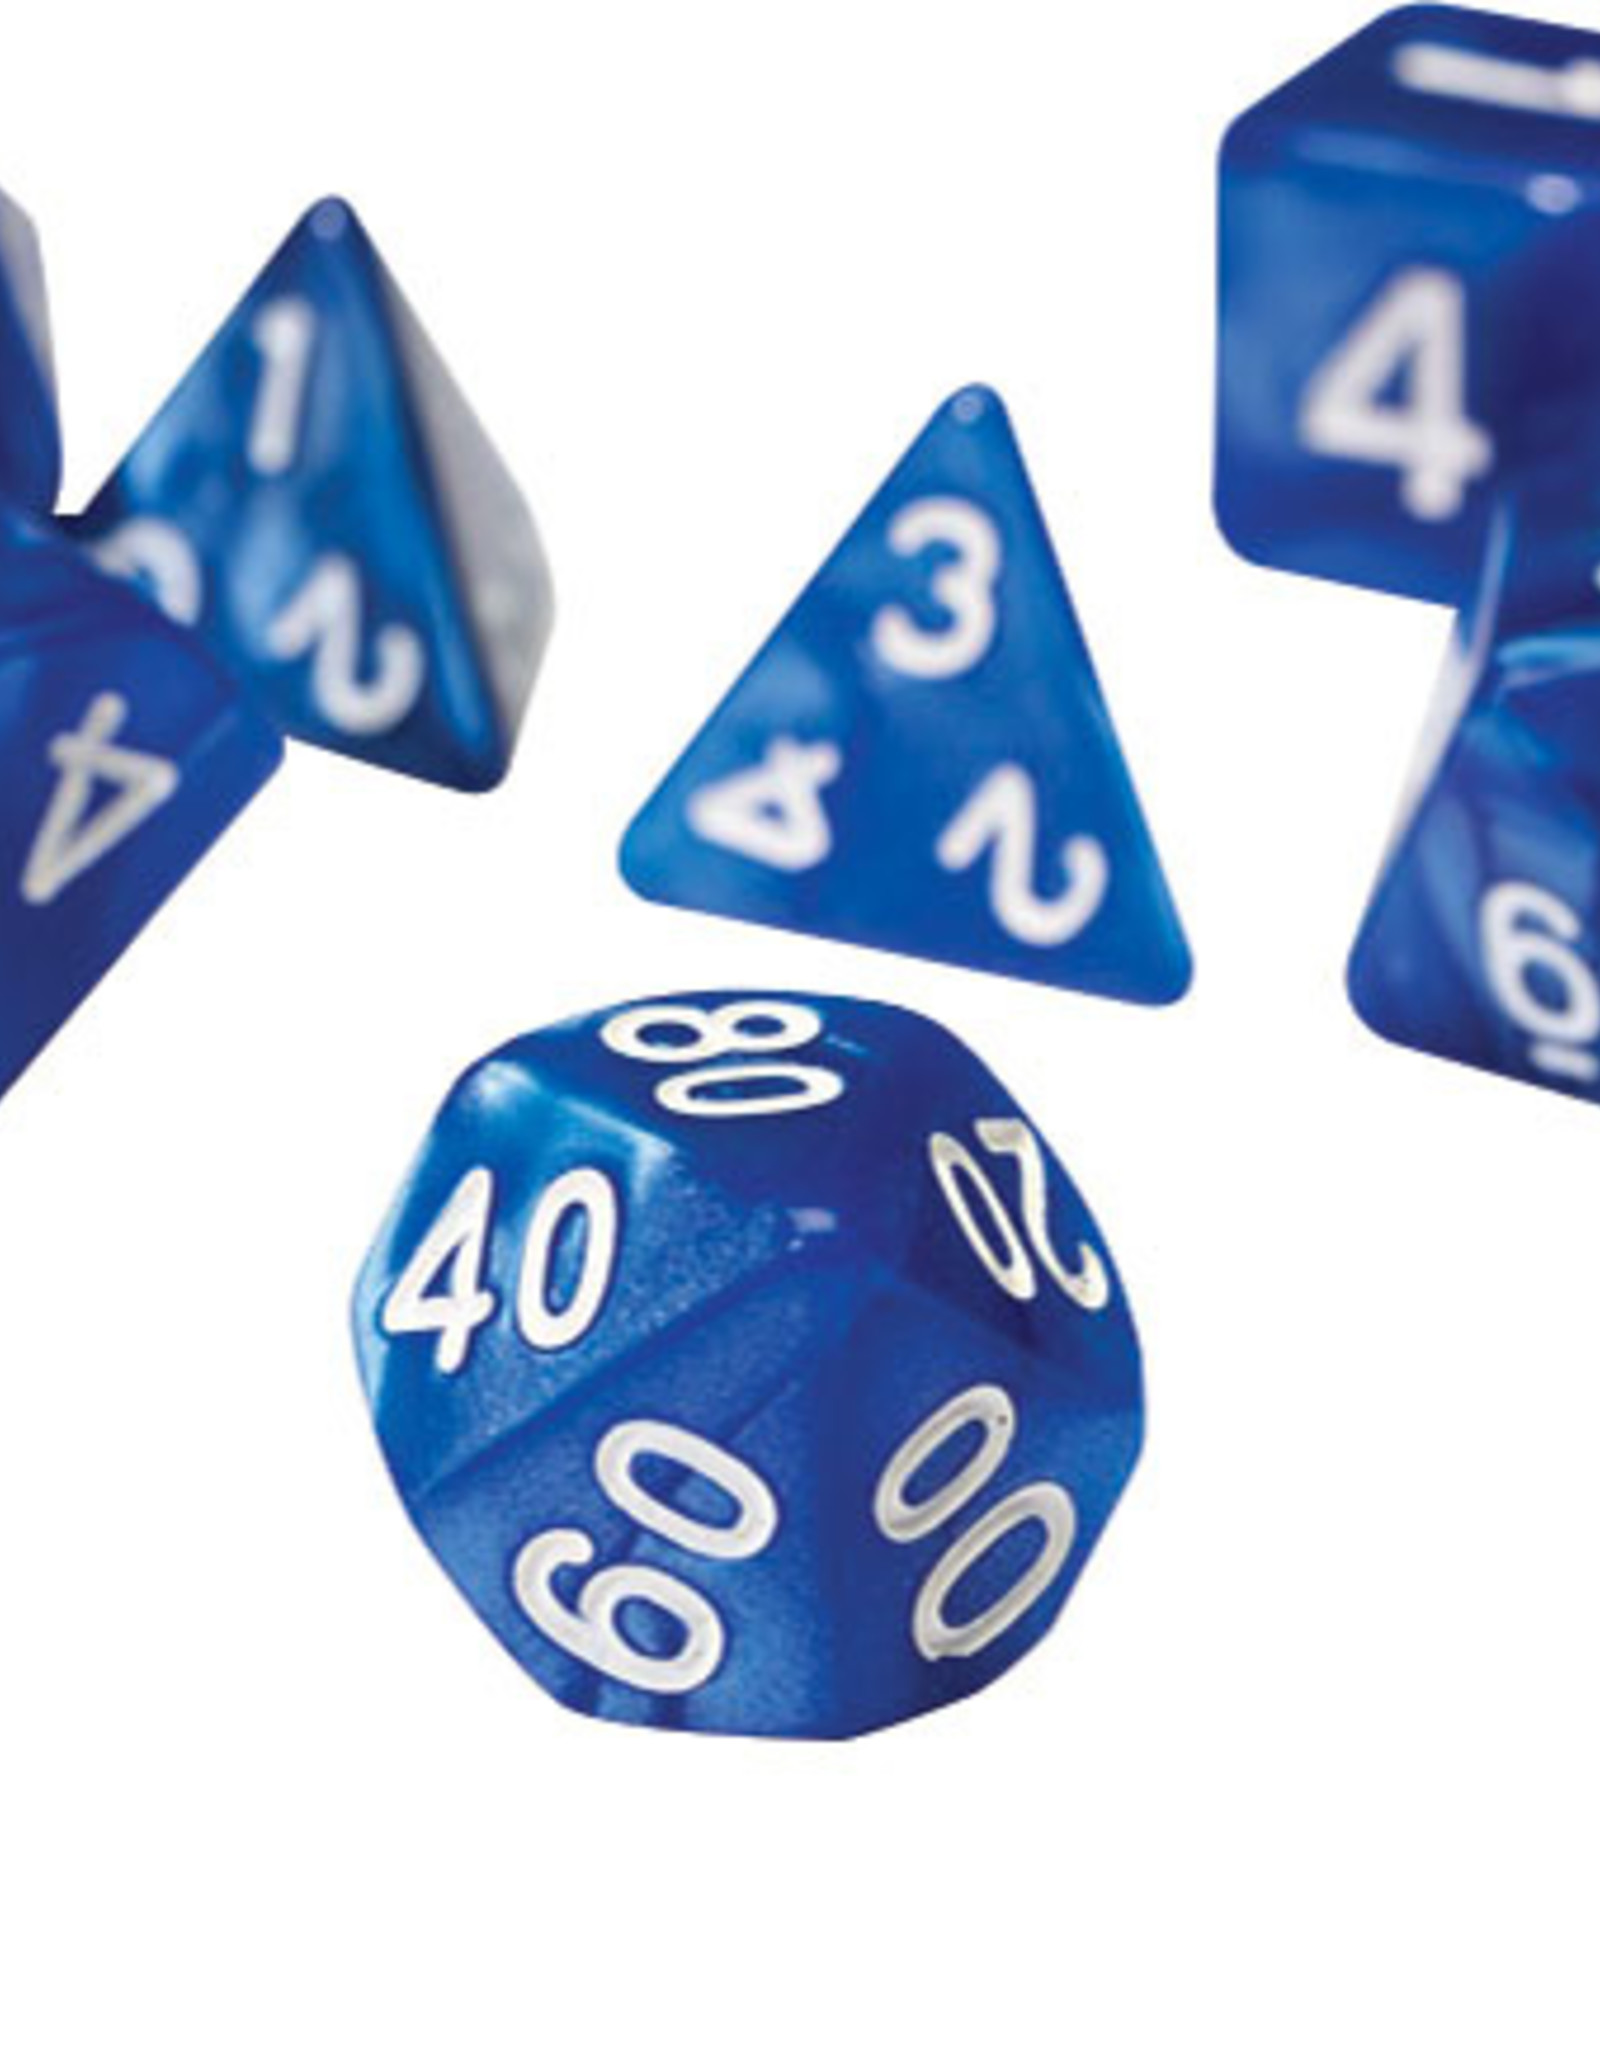 RPG Dice Set (7): Pearl Blue Acrylic